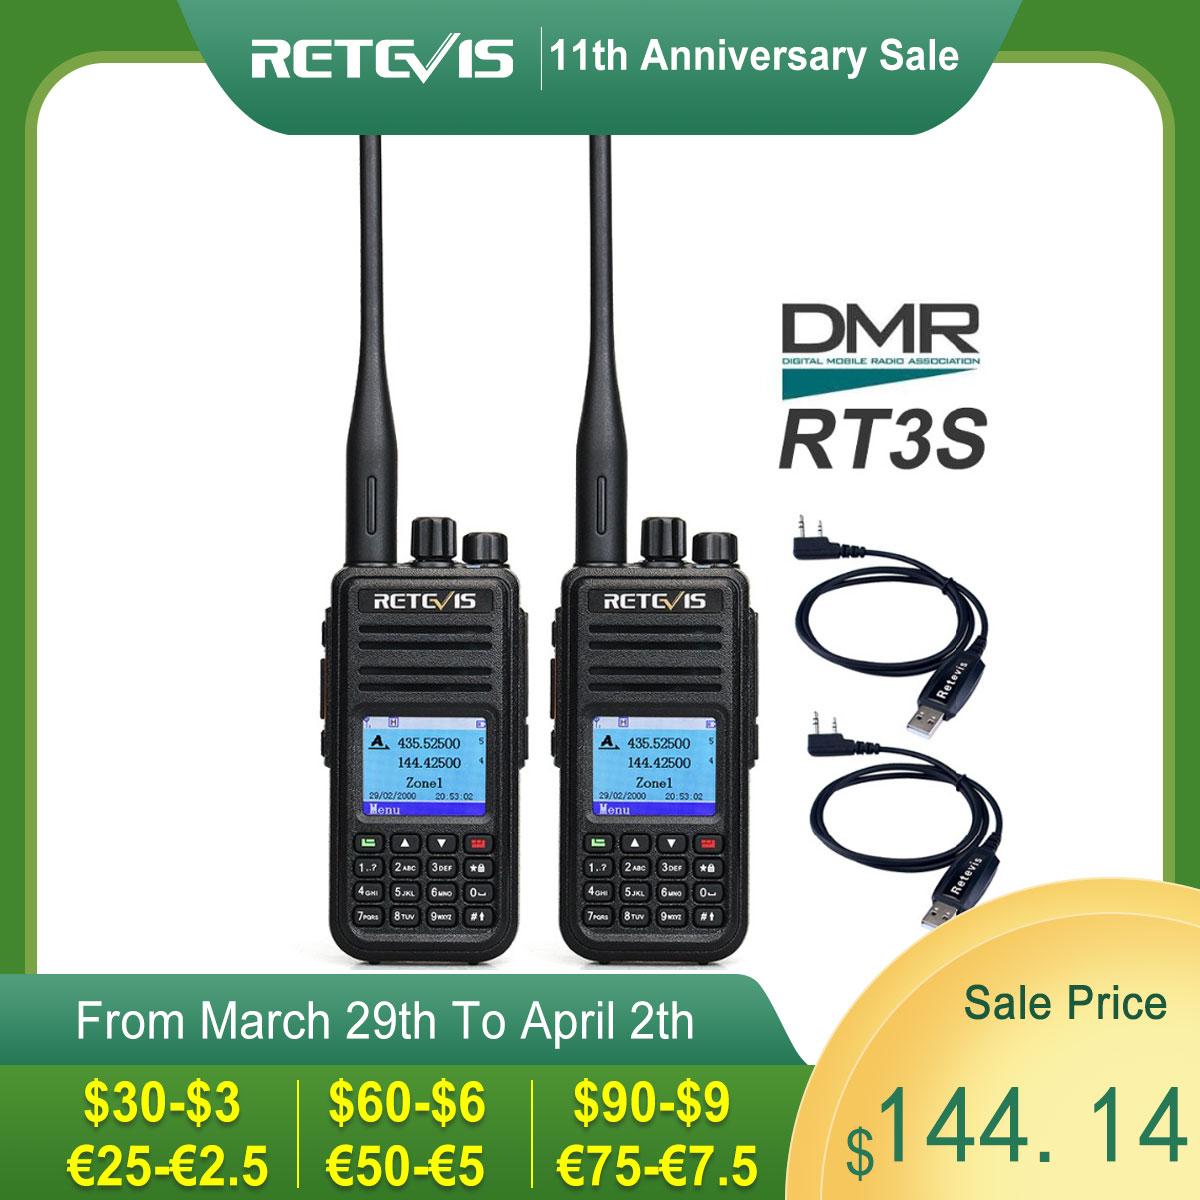 DMR Dual Band Digital Walkie Talkie 2pcs Retevis RT3S VHF UHF GPS Ham Radio Amador Transceiver Portable Two Way Radio Station